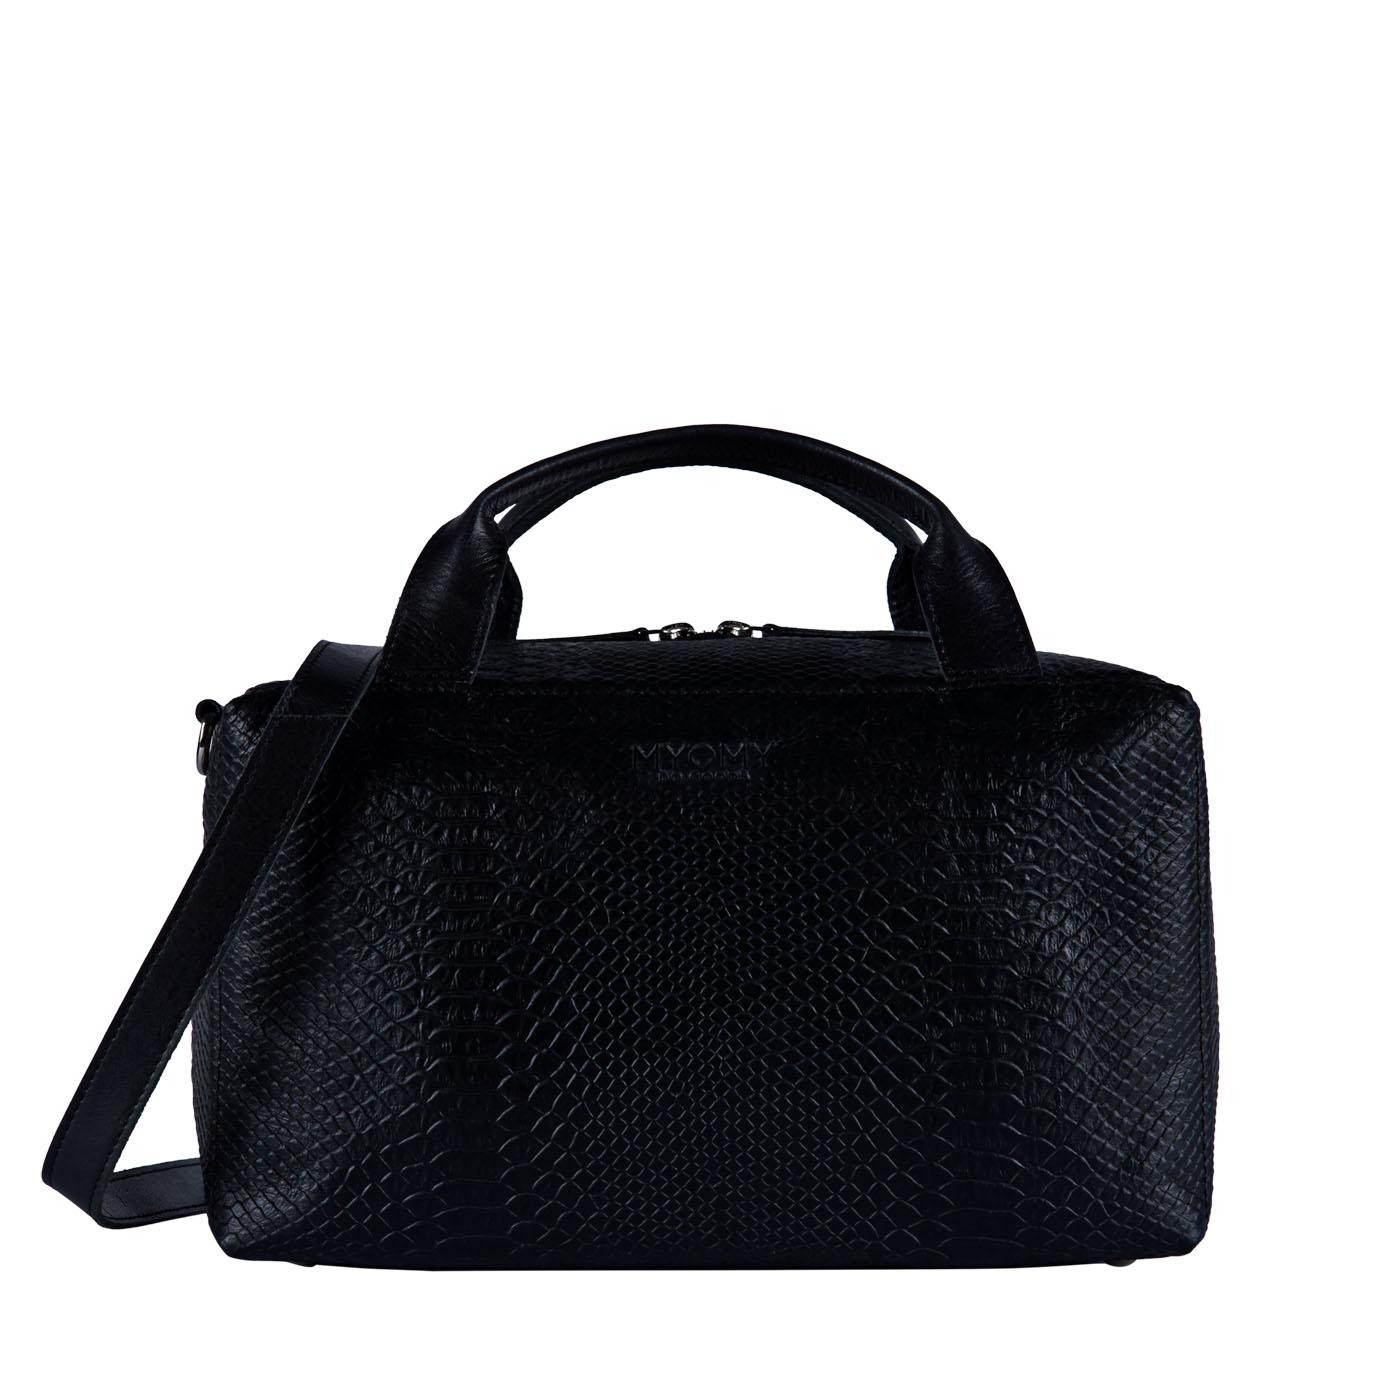 MY BOXY BAG Workbag - mix anaconda & hunter waxy black